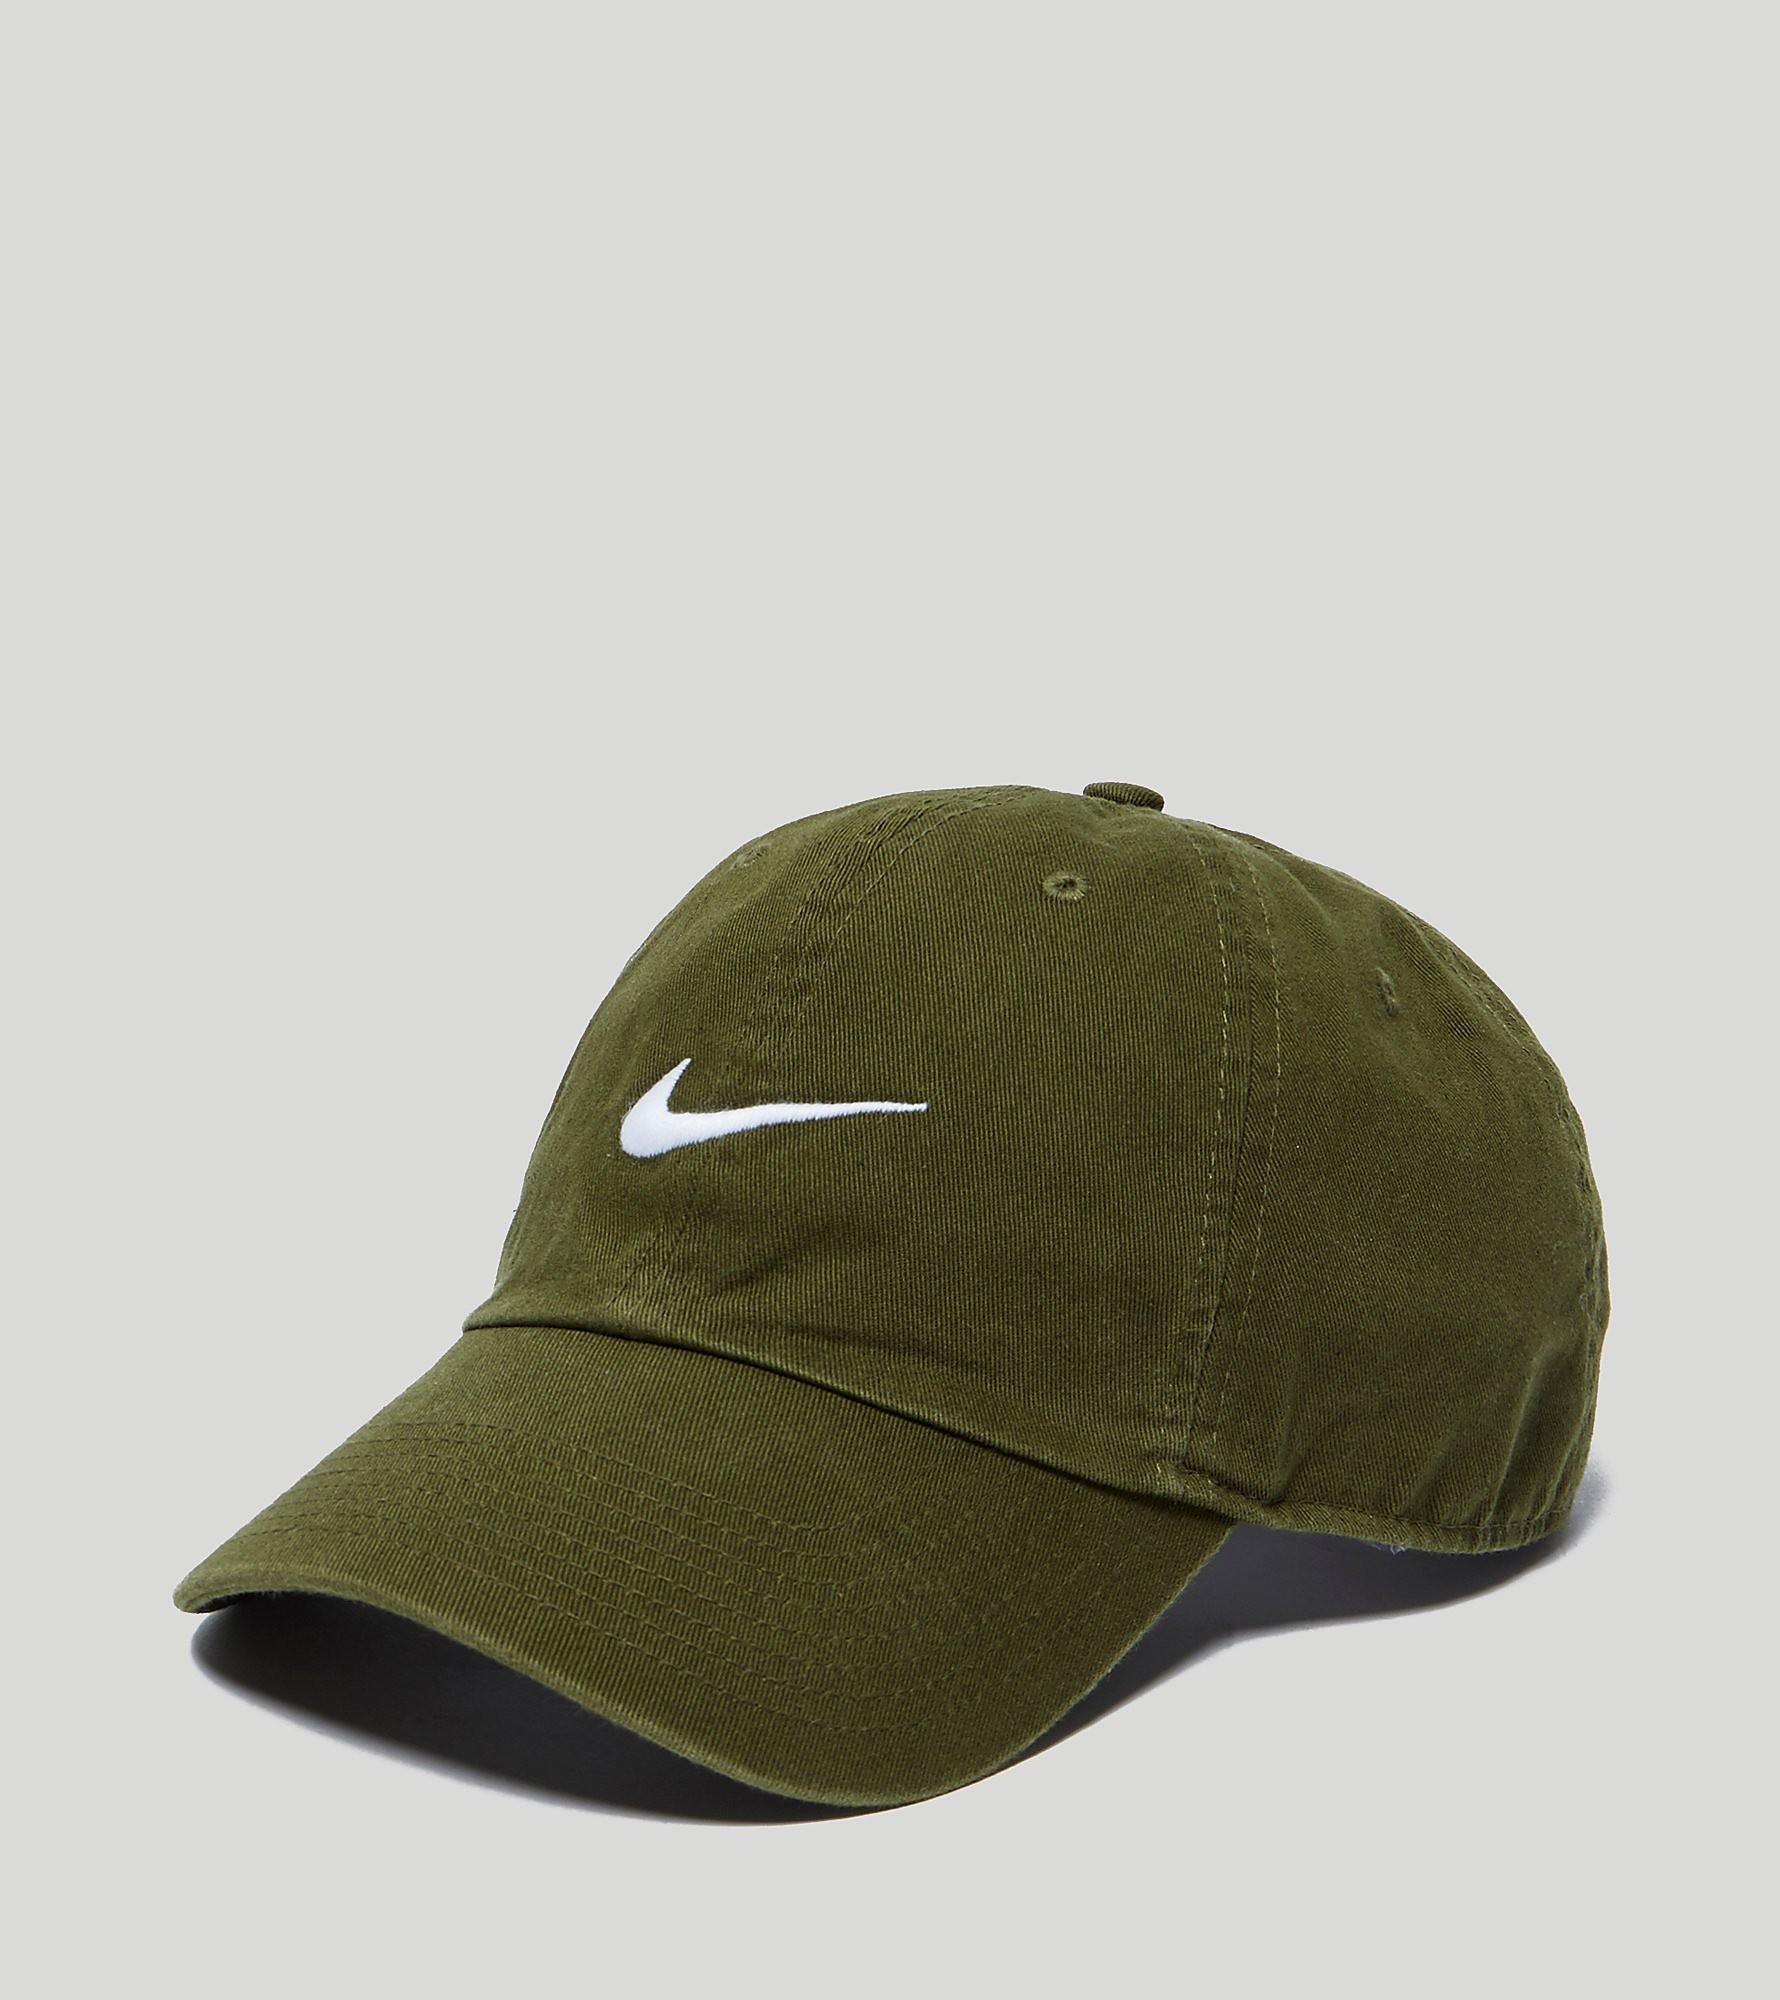 Nike Heritage '86 Swoosh Cap